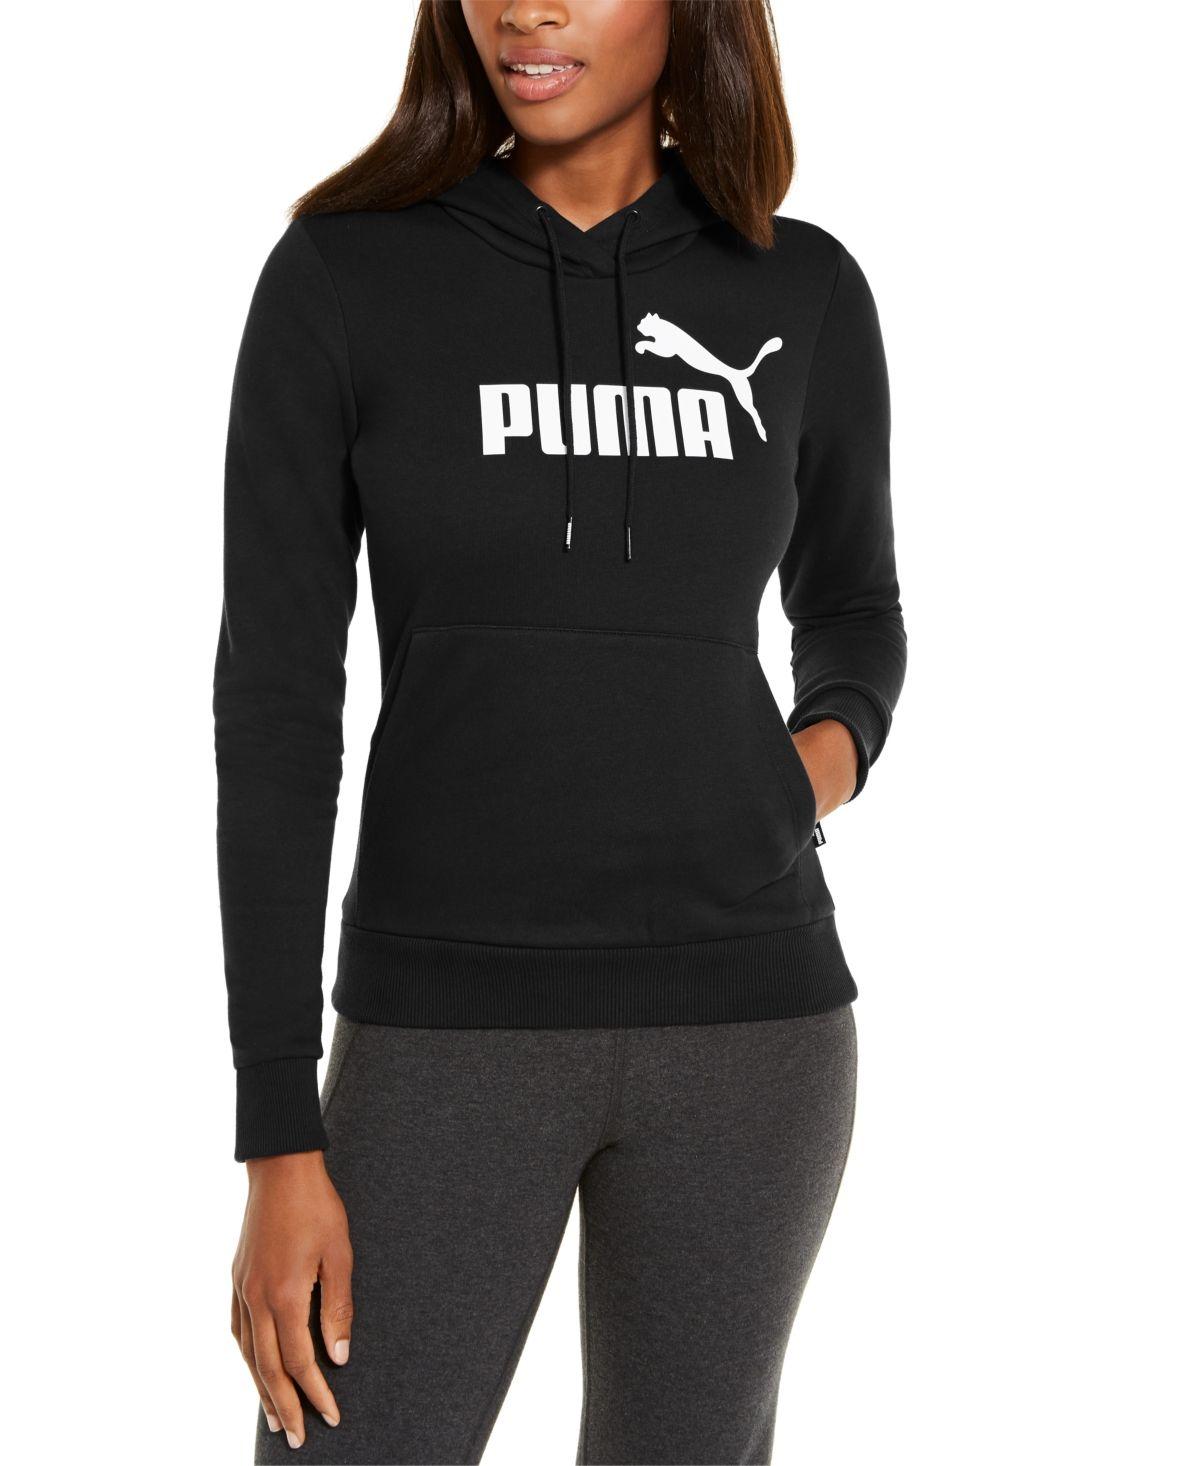 PUMA Fleece Hoodie Women's Sport Inspired Clothing